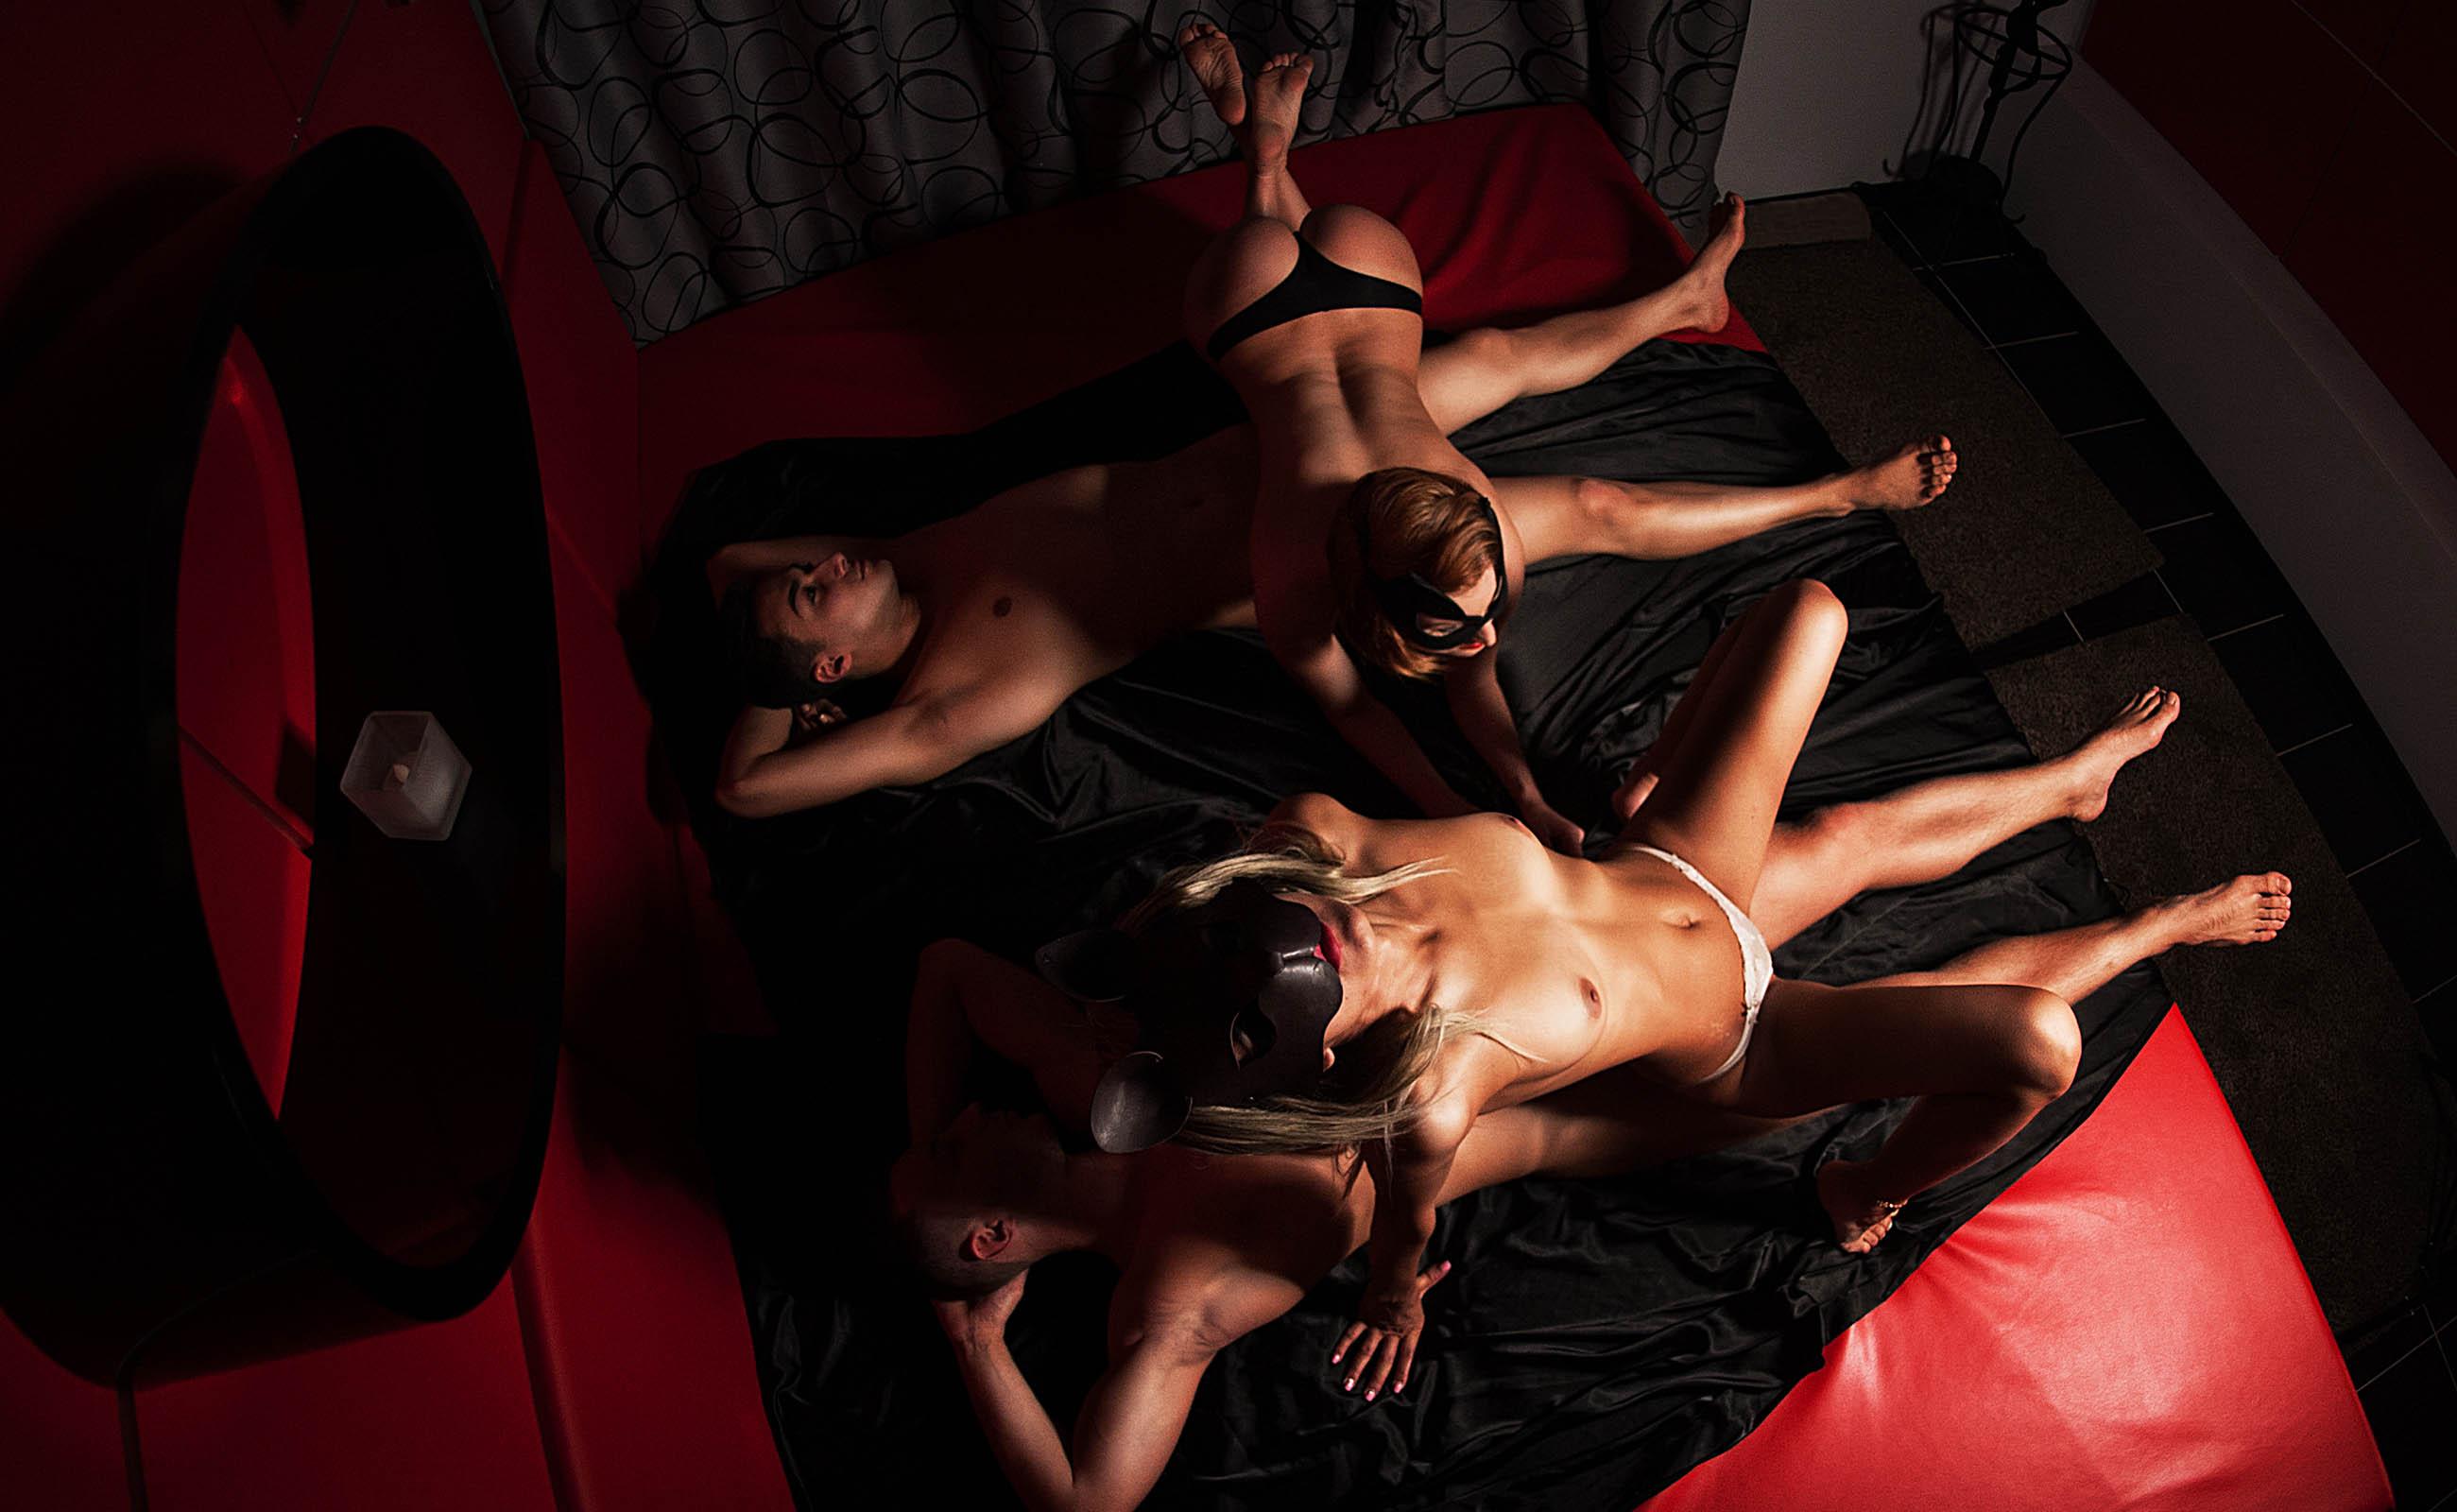 порно массажный салон семейных